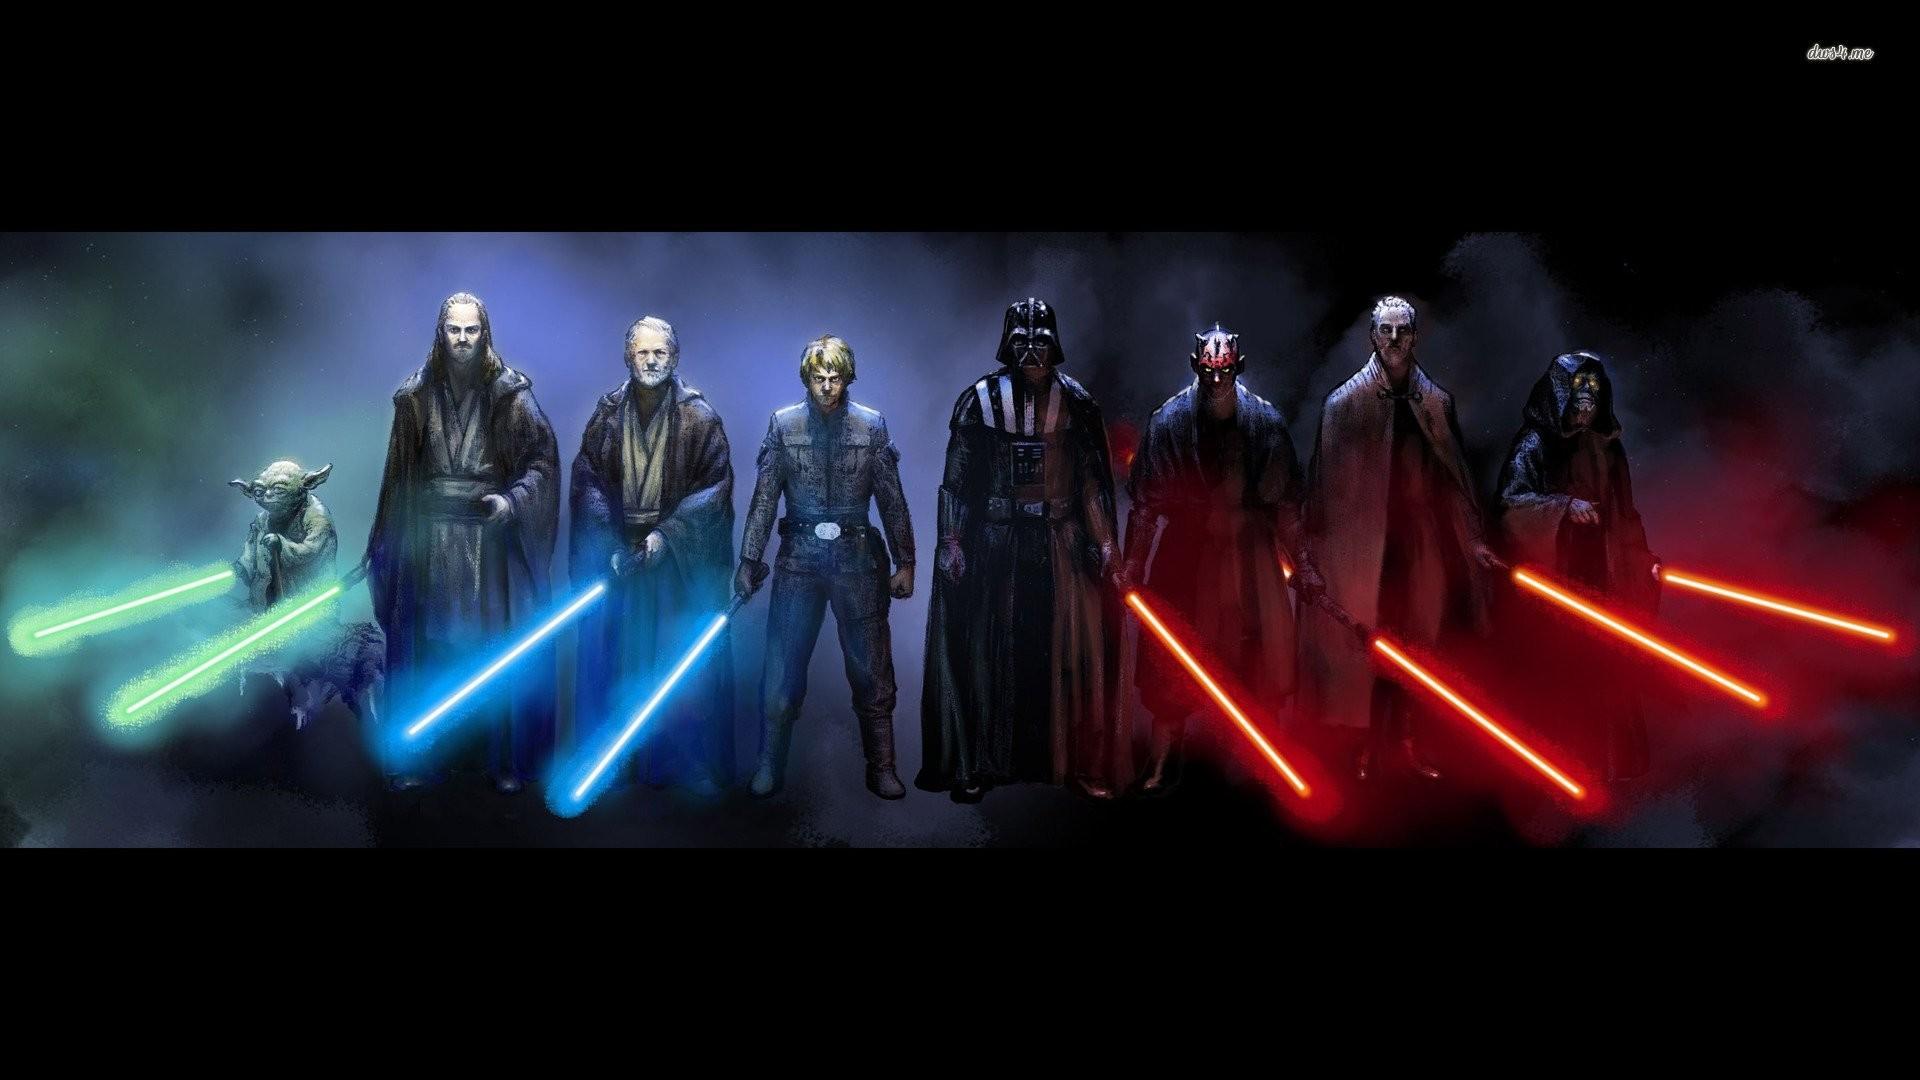 Jedi And Sith – Star Wars 776790 …